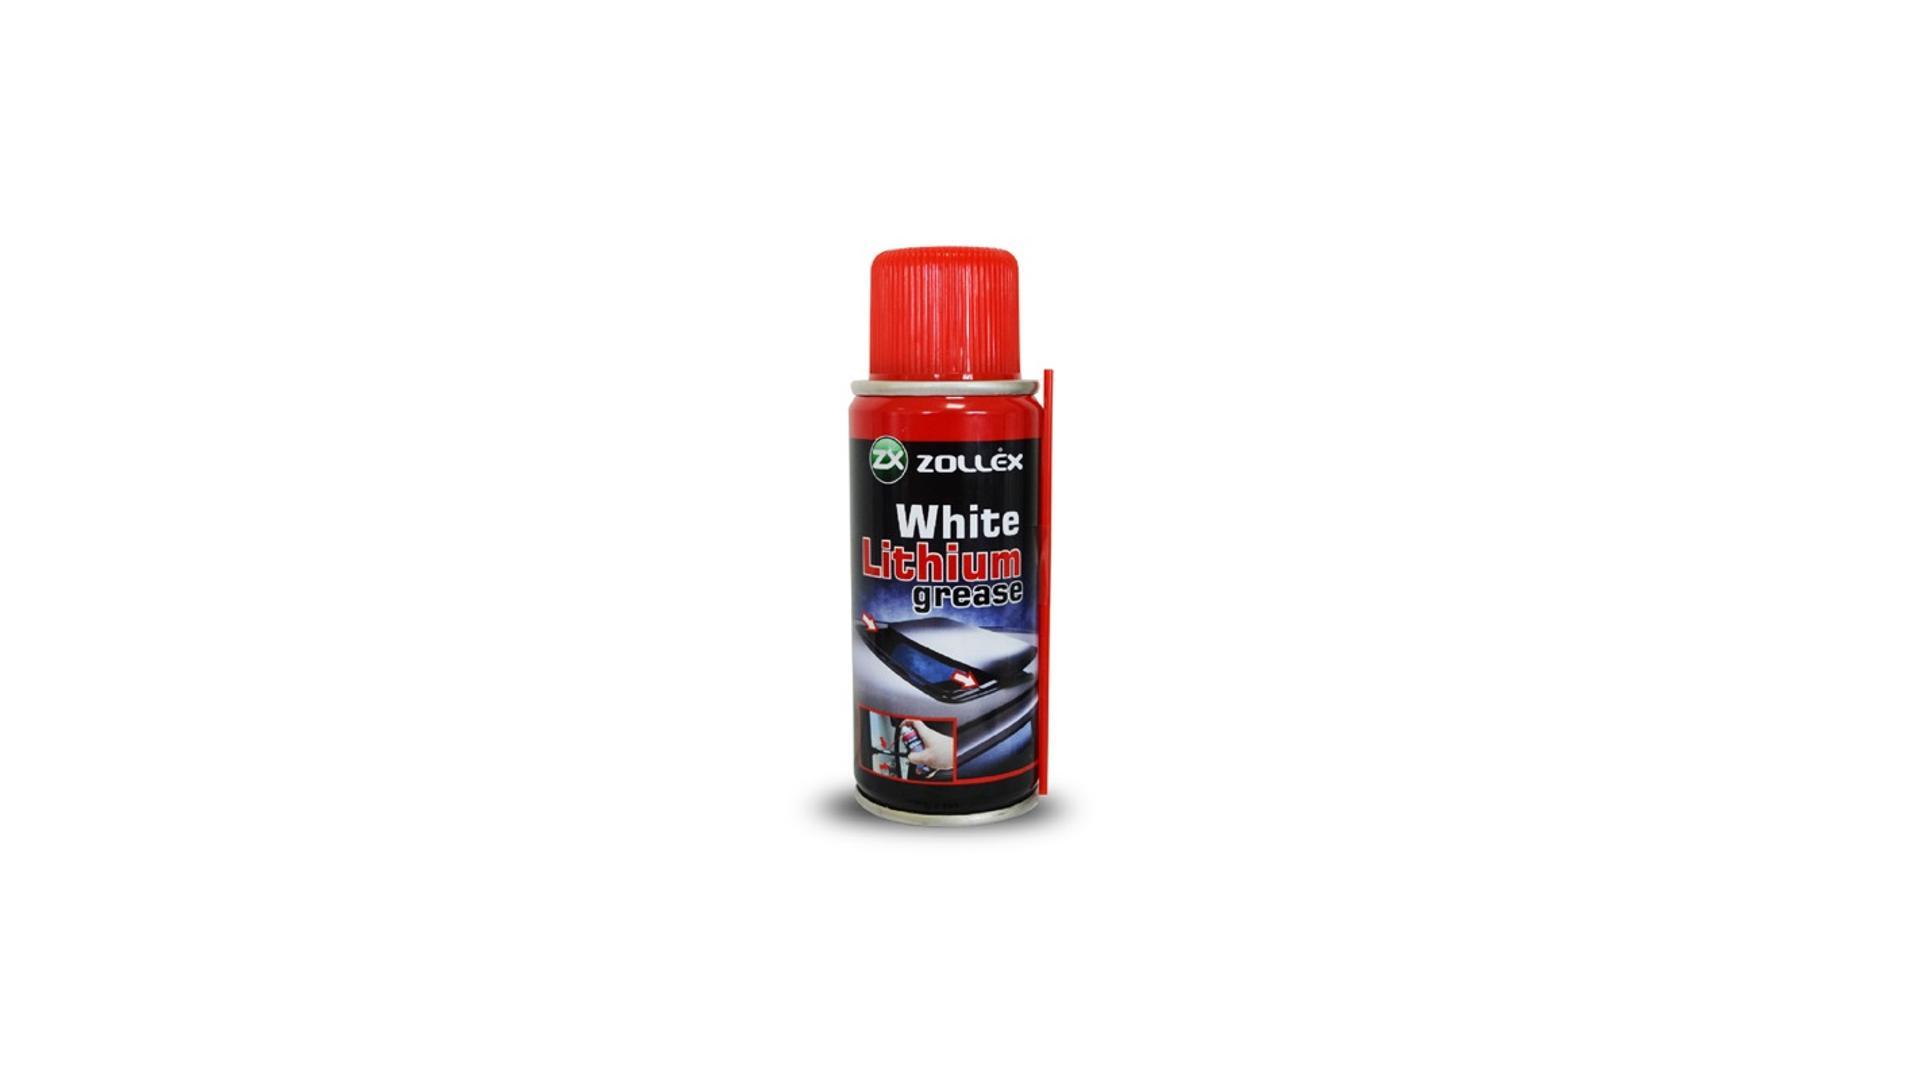 ZOLLEX Biele mazivo lithium v spreji 400 ml (WLG-48)